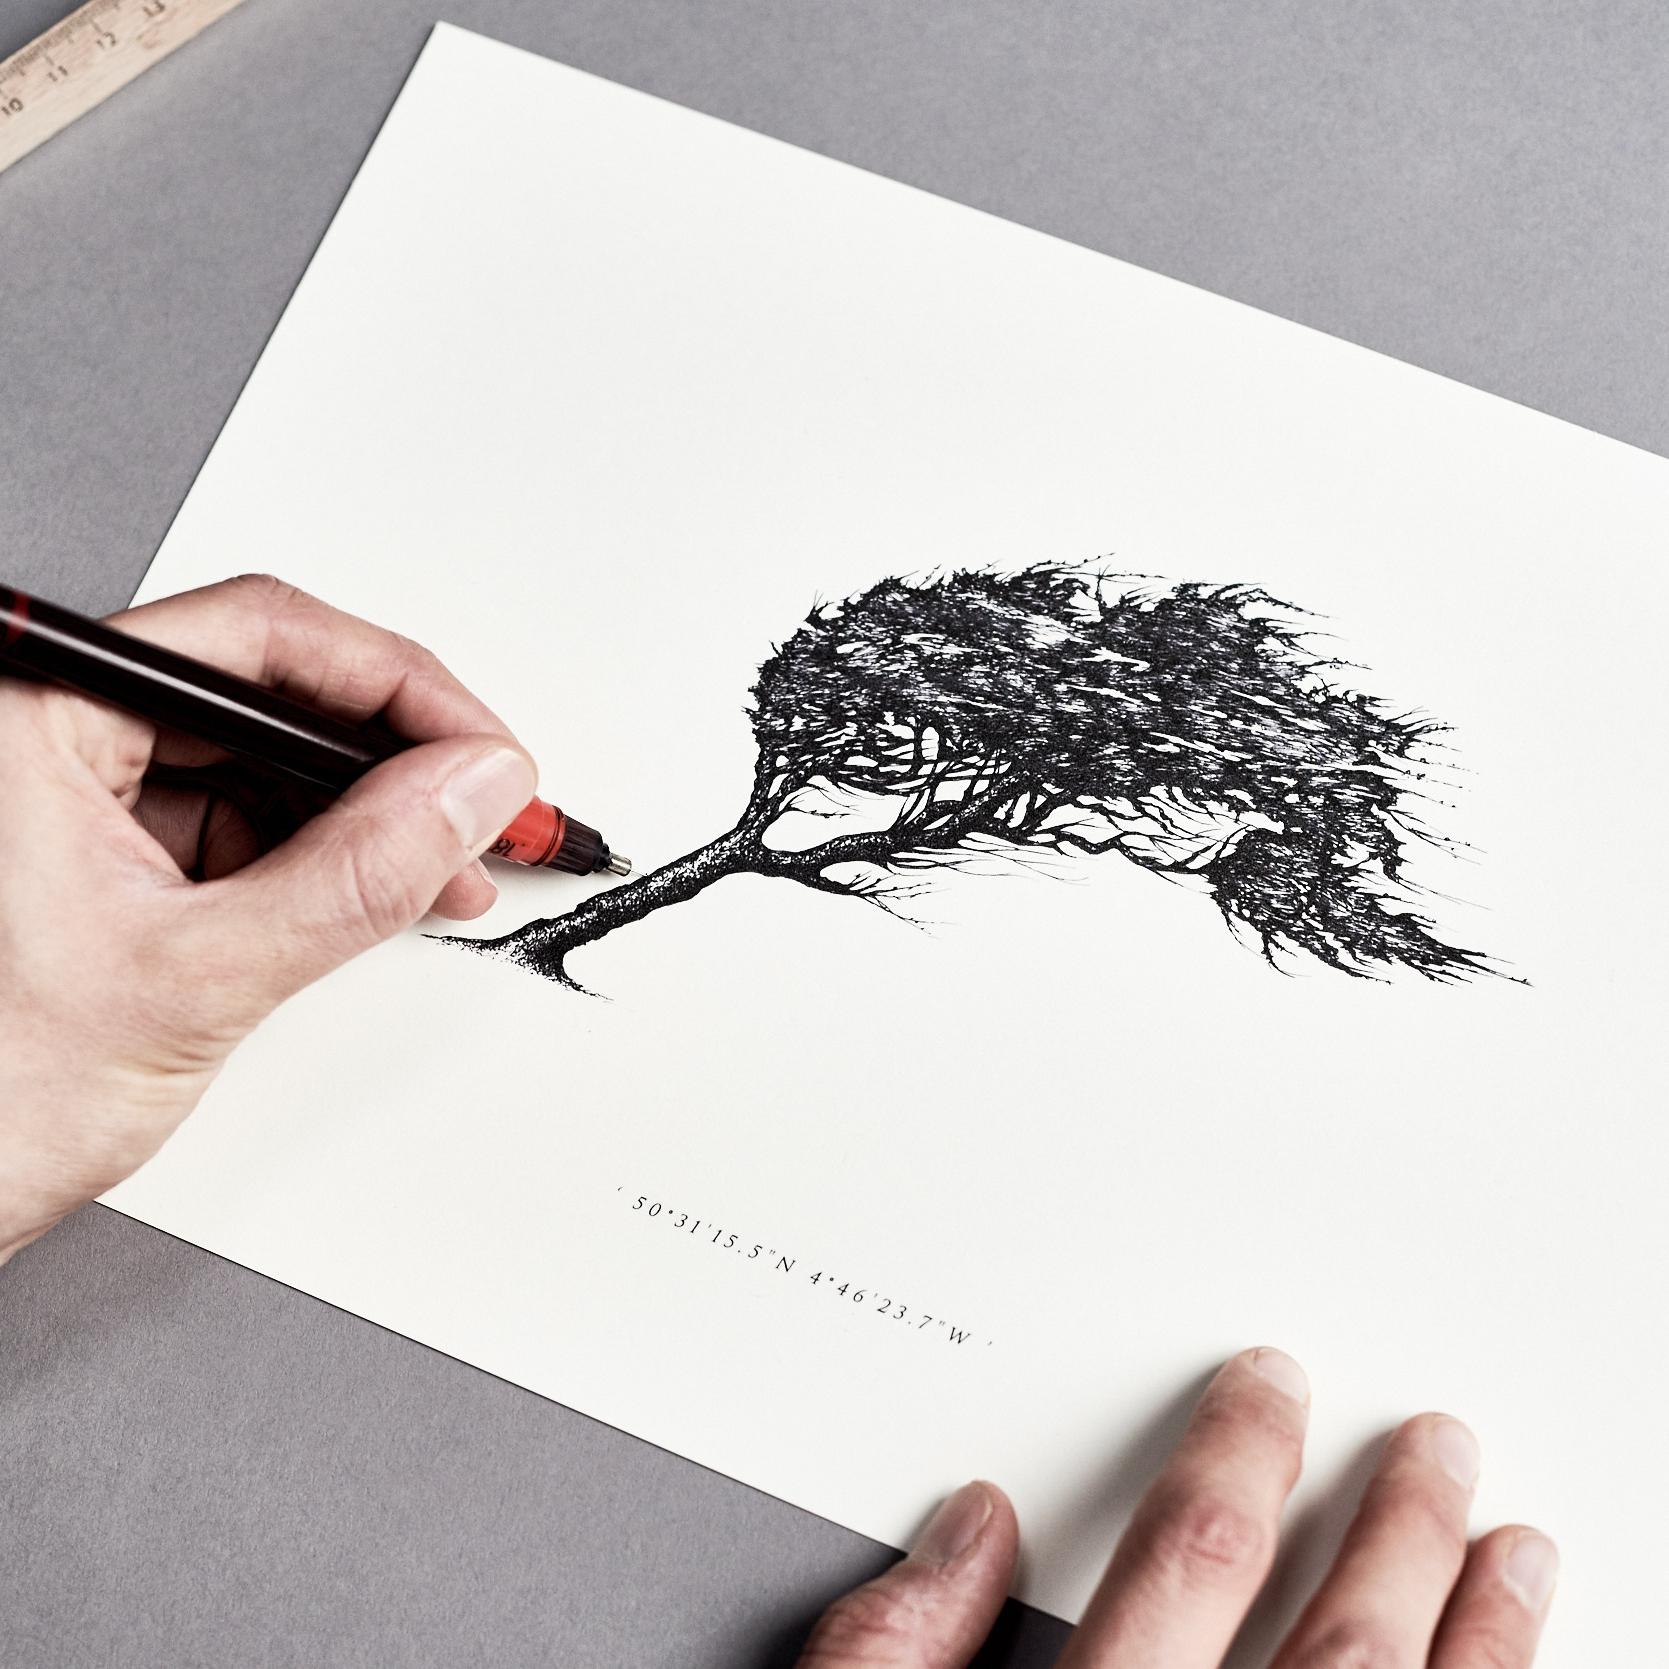 NICOLE HEIDARIPOUR     Illustration, design and printshop. Based in Cornwall.